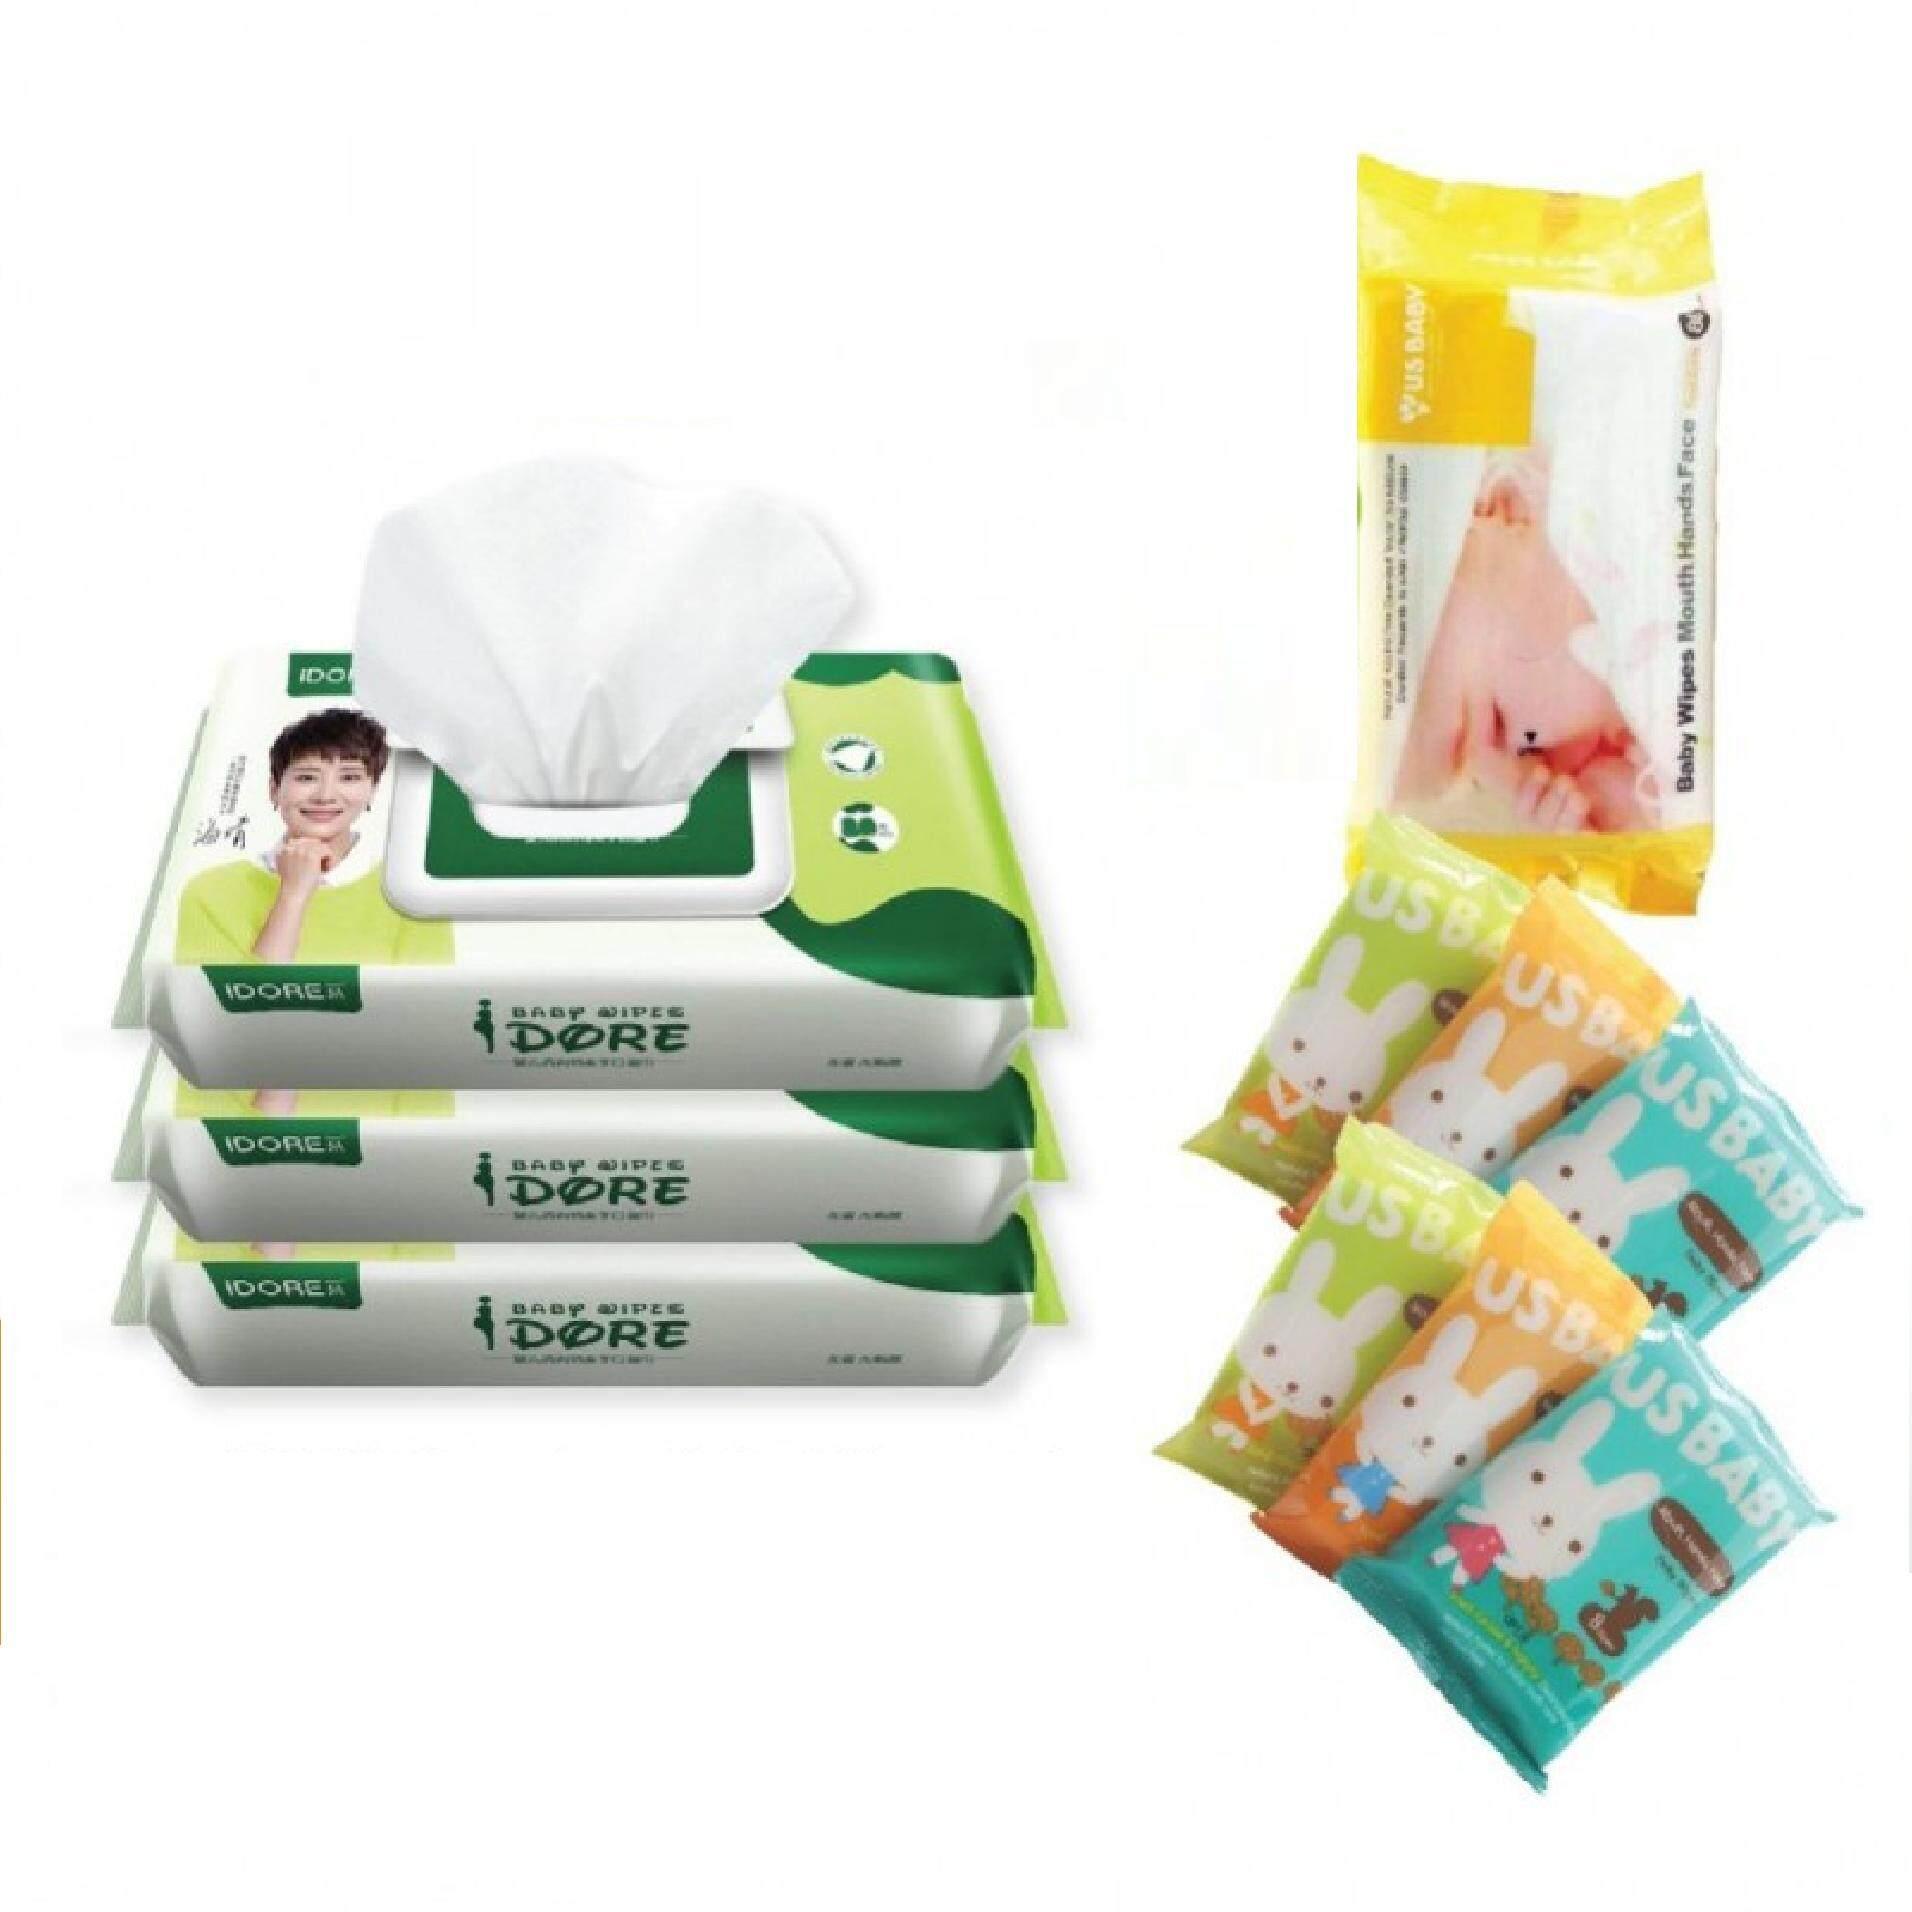 IDORE Premium Baby Wipes (80'S) Bundle Deal